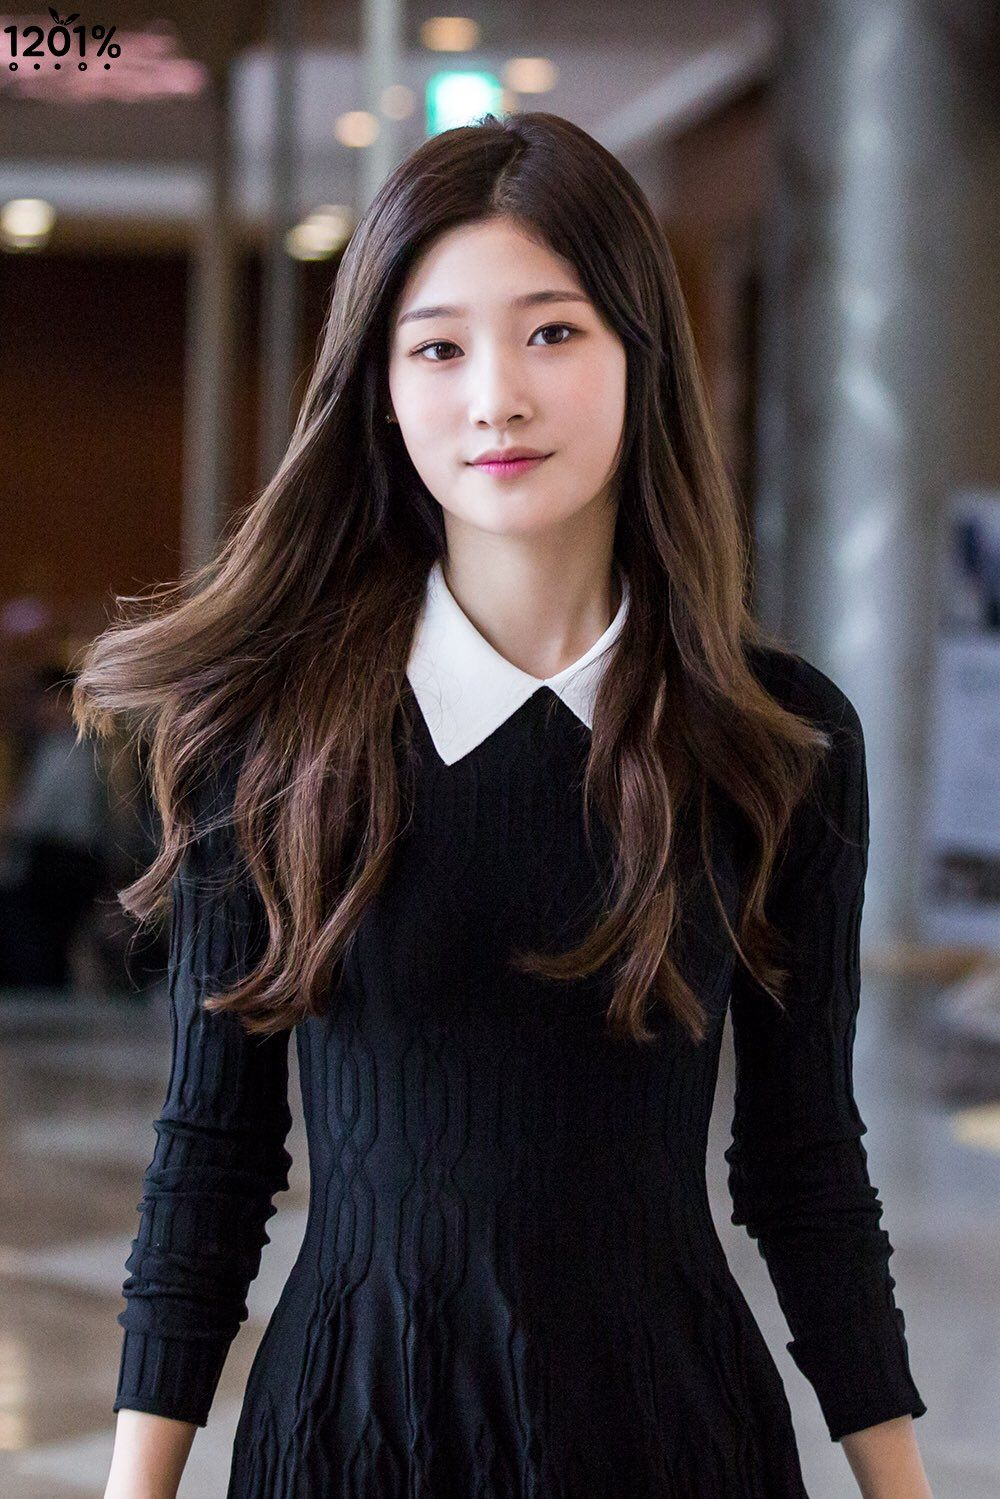 jung chaeyeon as cho chang beauty jung chaeyeon kpop